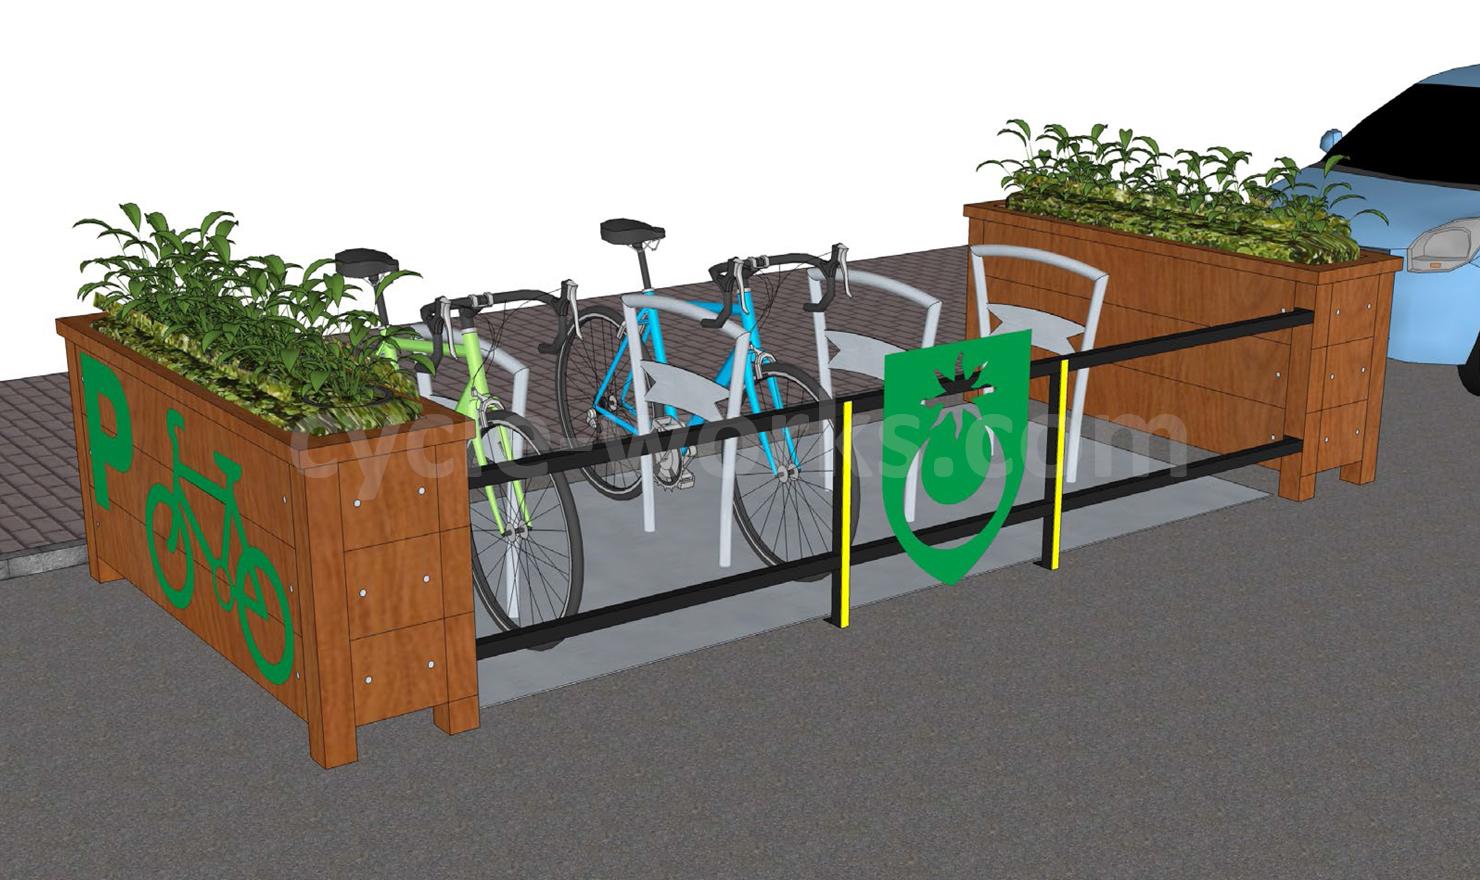 Bike Corrals and Bike Stands